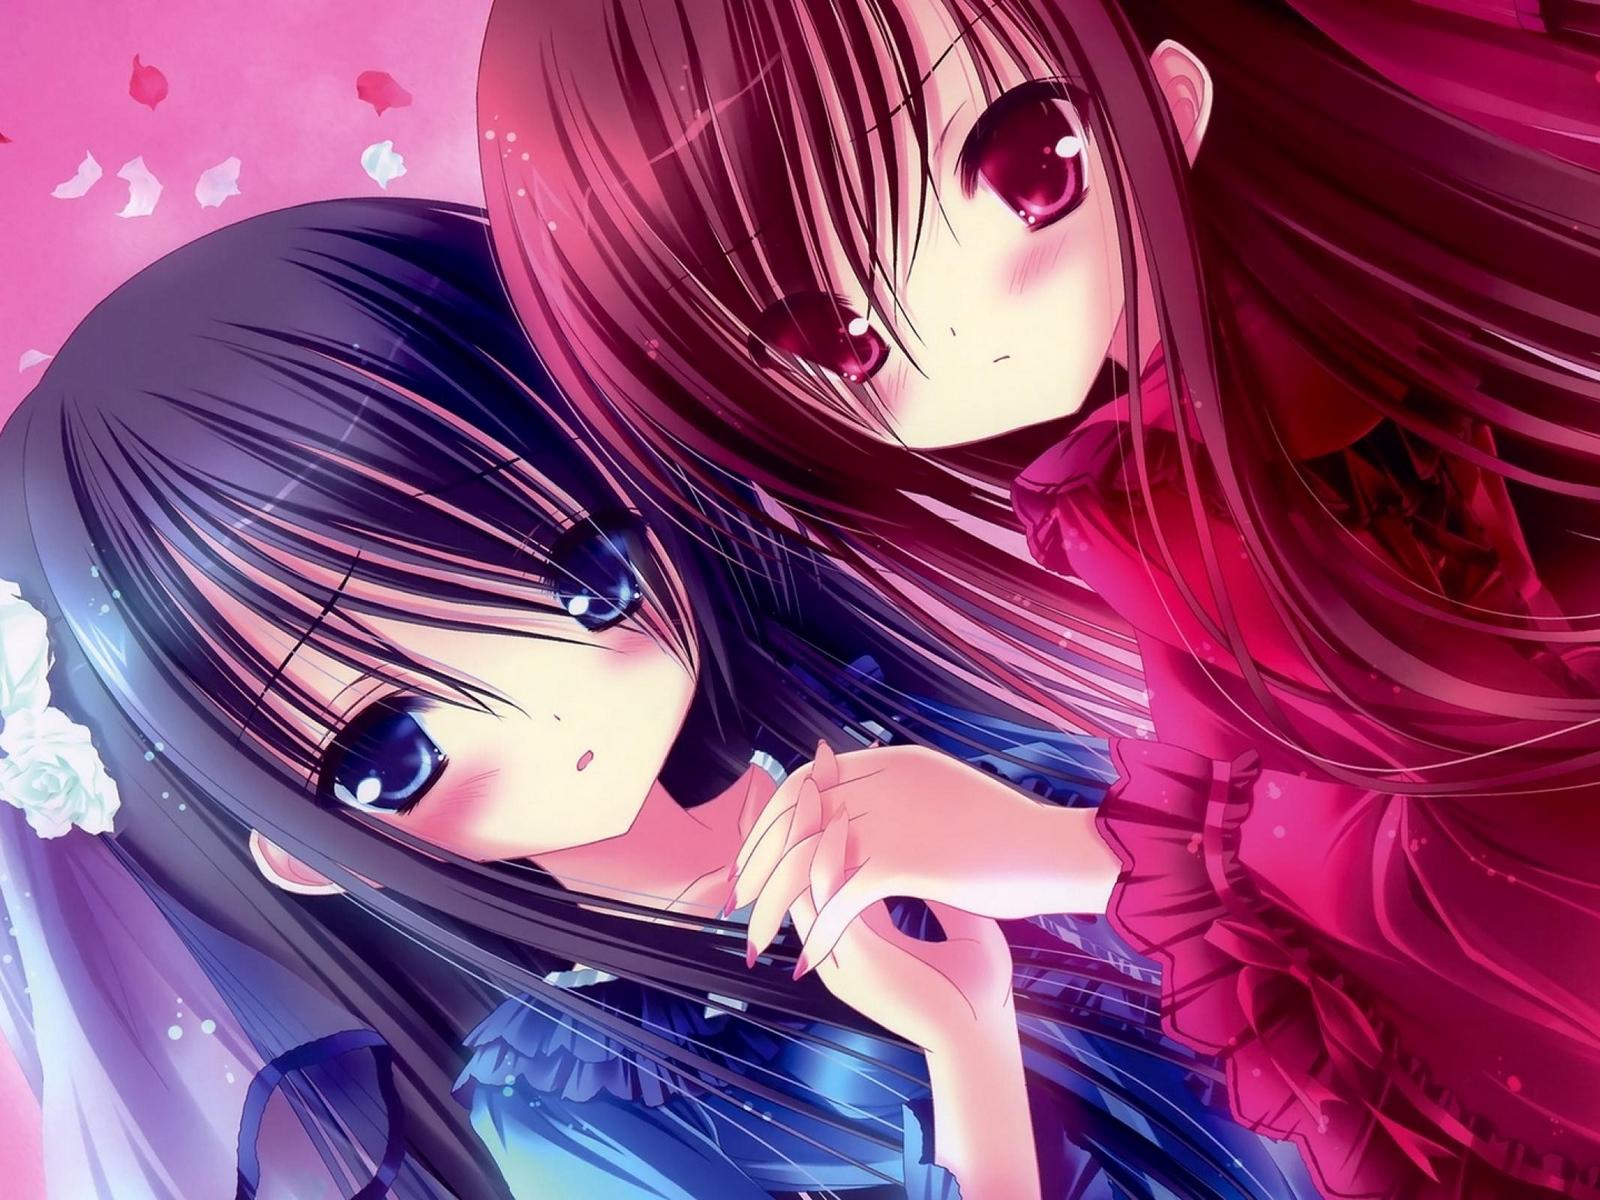 Wallpaper Kawaii, Anime, Girl, Friend, Person - Kawaii Wallpaper Anime Girl - HD Wallpaper